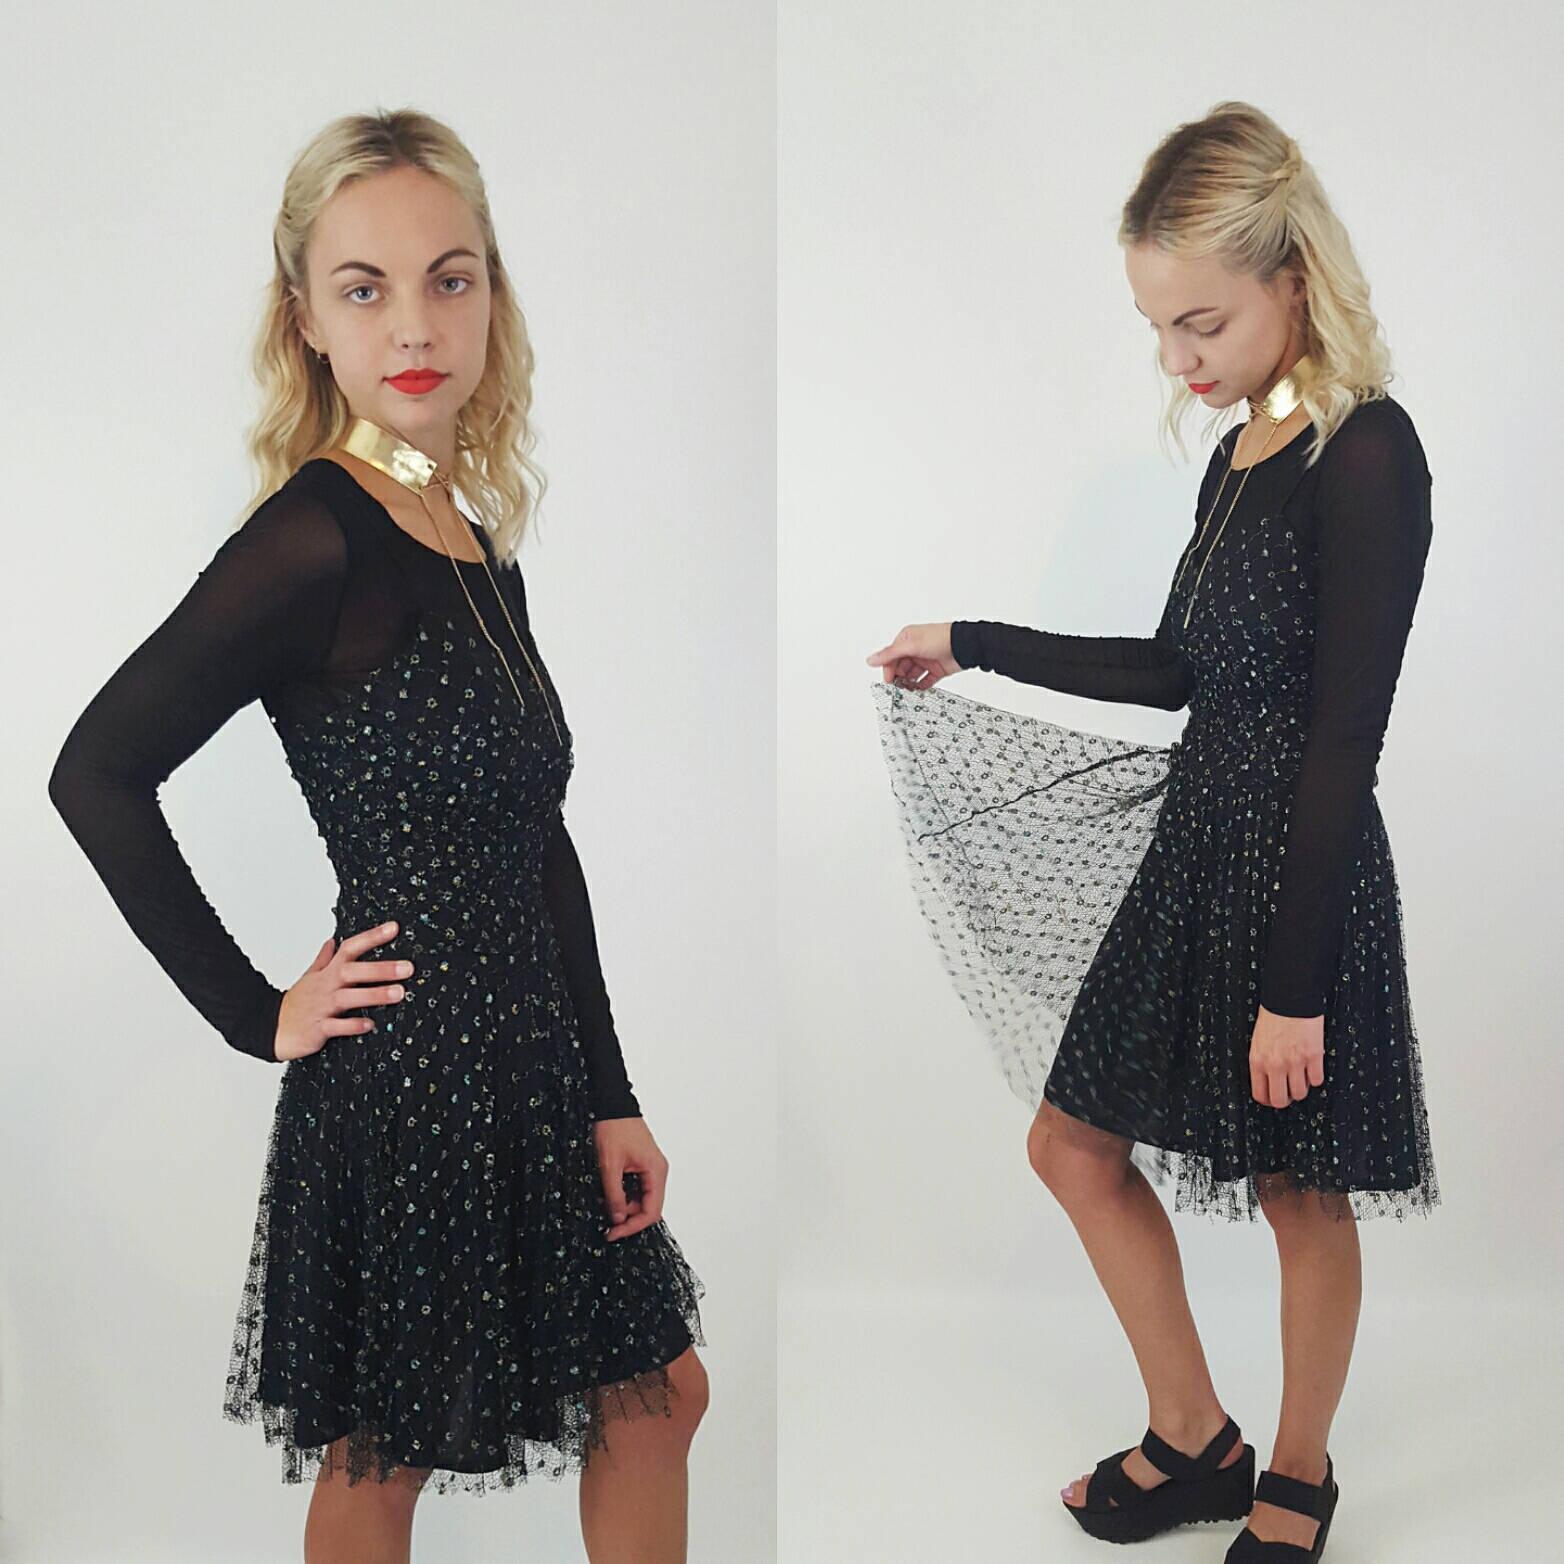 87615382 Betsey Johnson Sheer Black Sparkle Dress Small- Spaghetti Strap Party Dress  with Iridescent Glitter Confetti Overlay - Sleeveless Minidress